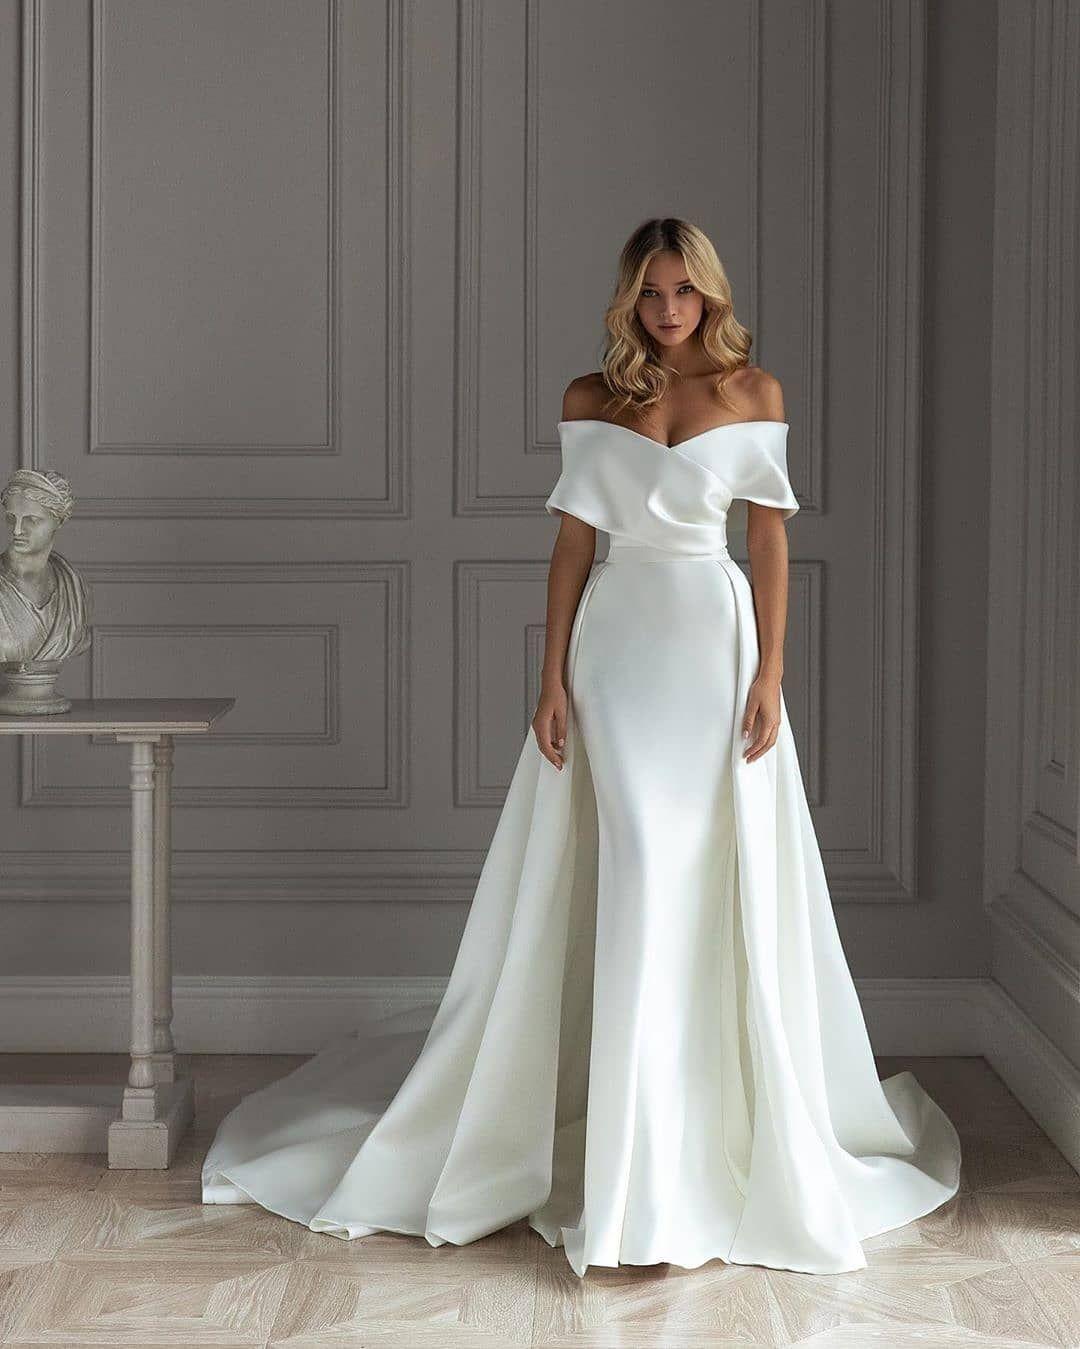 931 Mentions J Aime 12 Commentaires Africa S Top Wedding Website Bellanaijawedding Stylish Wedding Dresses Formal Dresses For Weddings Formal Wear Dresses [ 1349 x 1080 Pixel ]